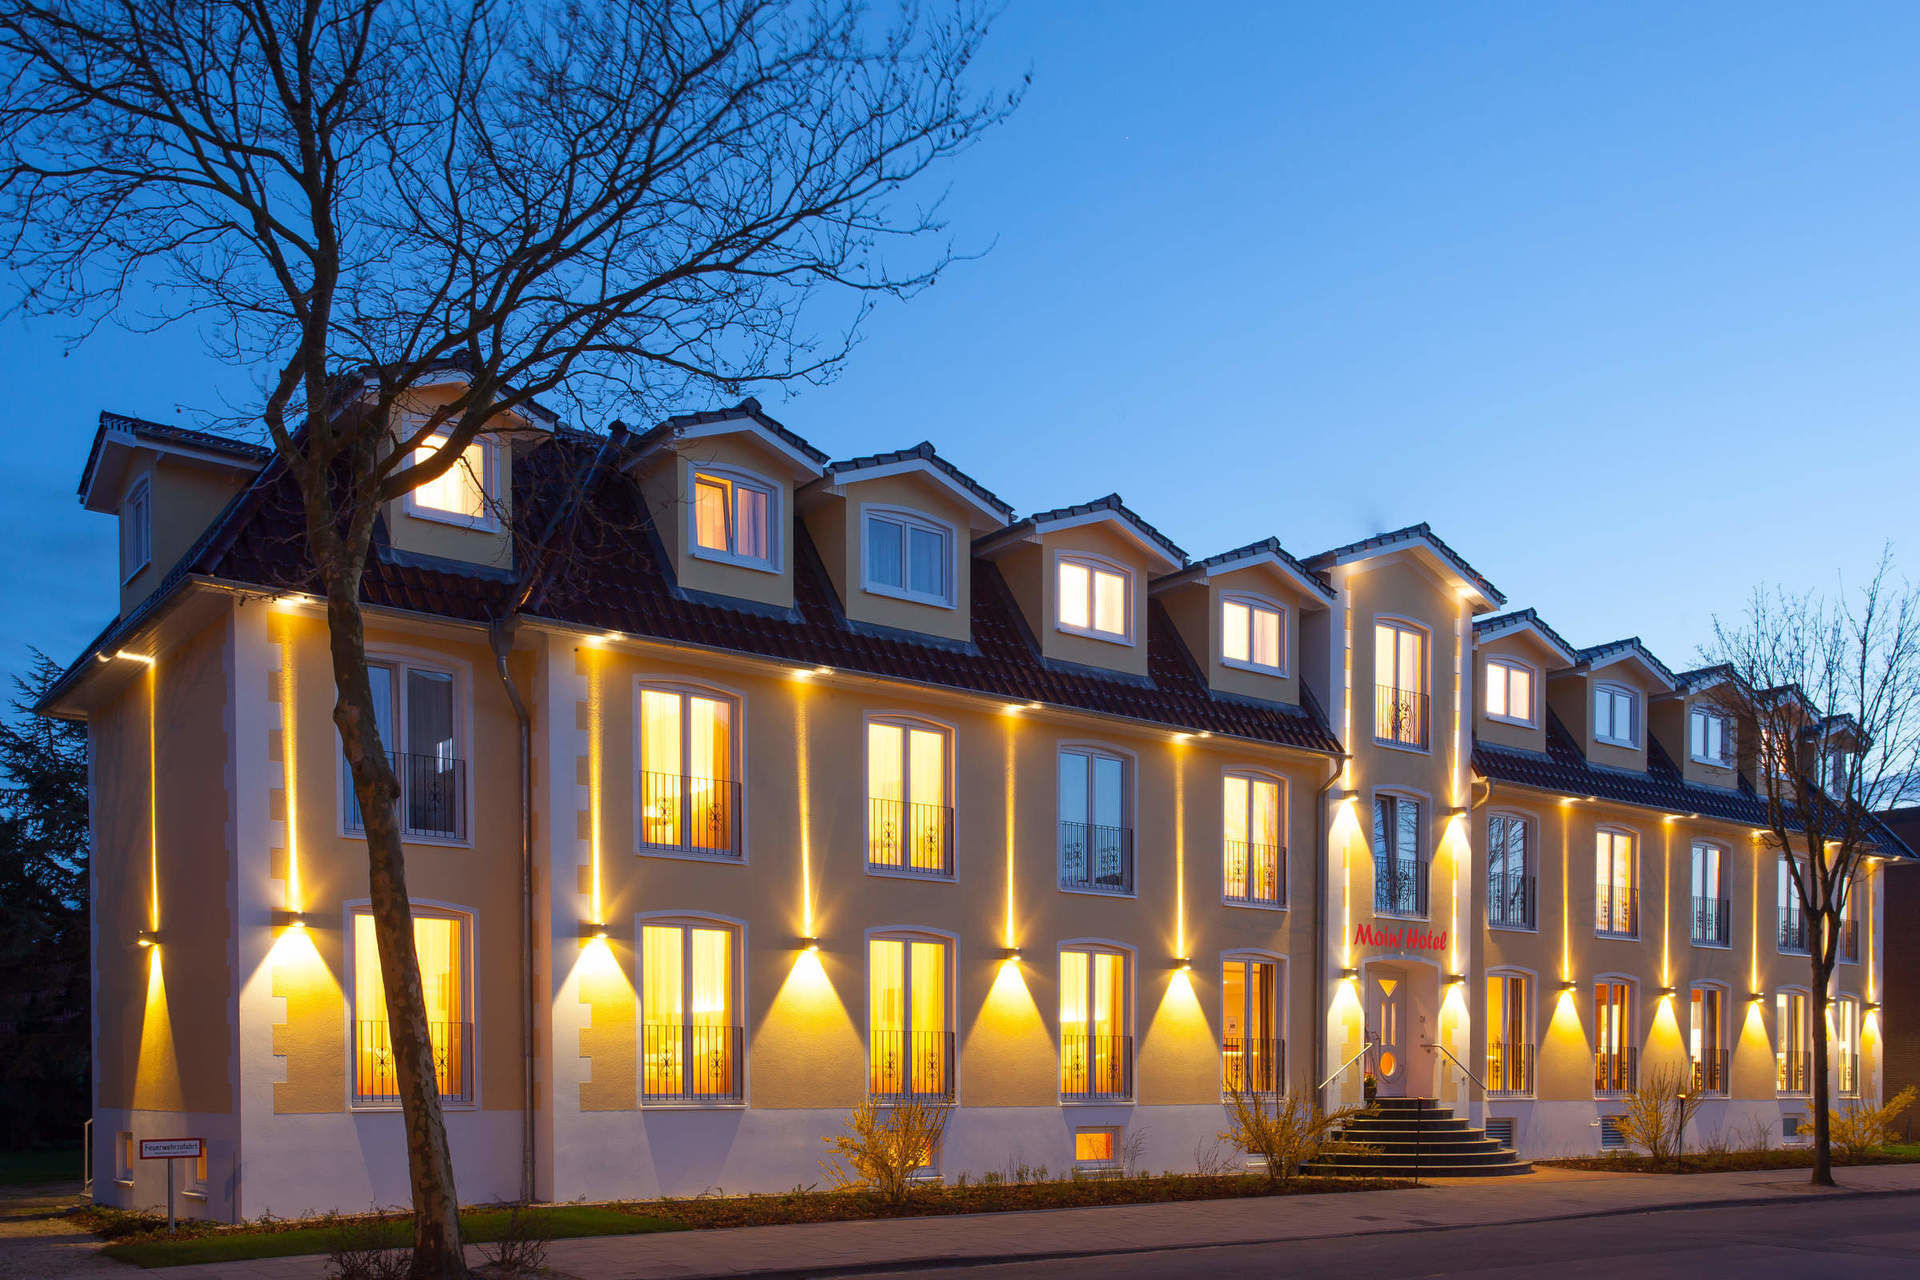 moin hotel cuxhaven urlaub wattenmeer hotels nordsee wellness familienurlaub wattenmeer. Black Bedroom Furniture Sets. Home Design Ideas